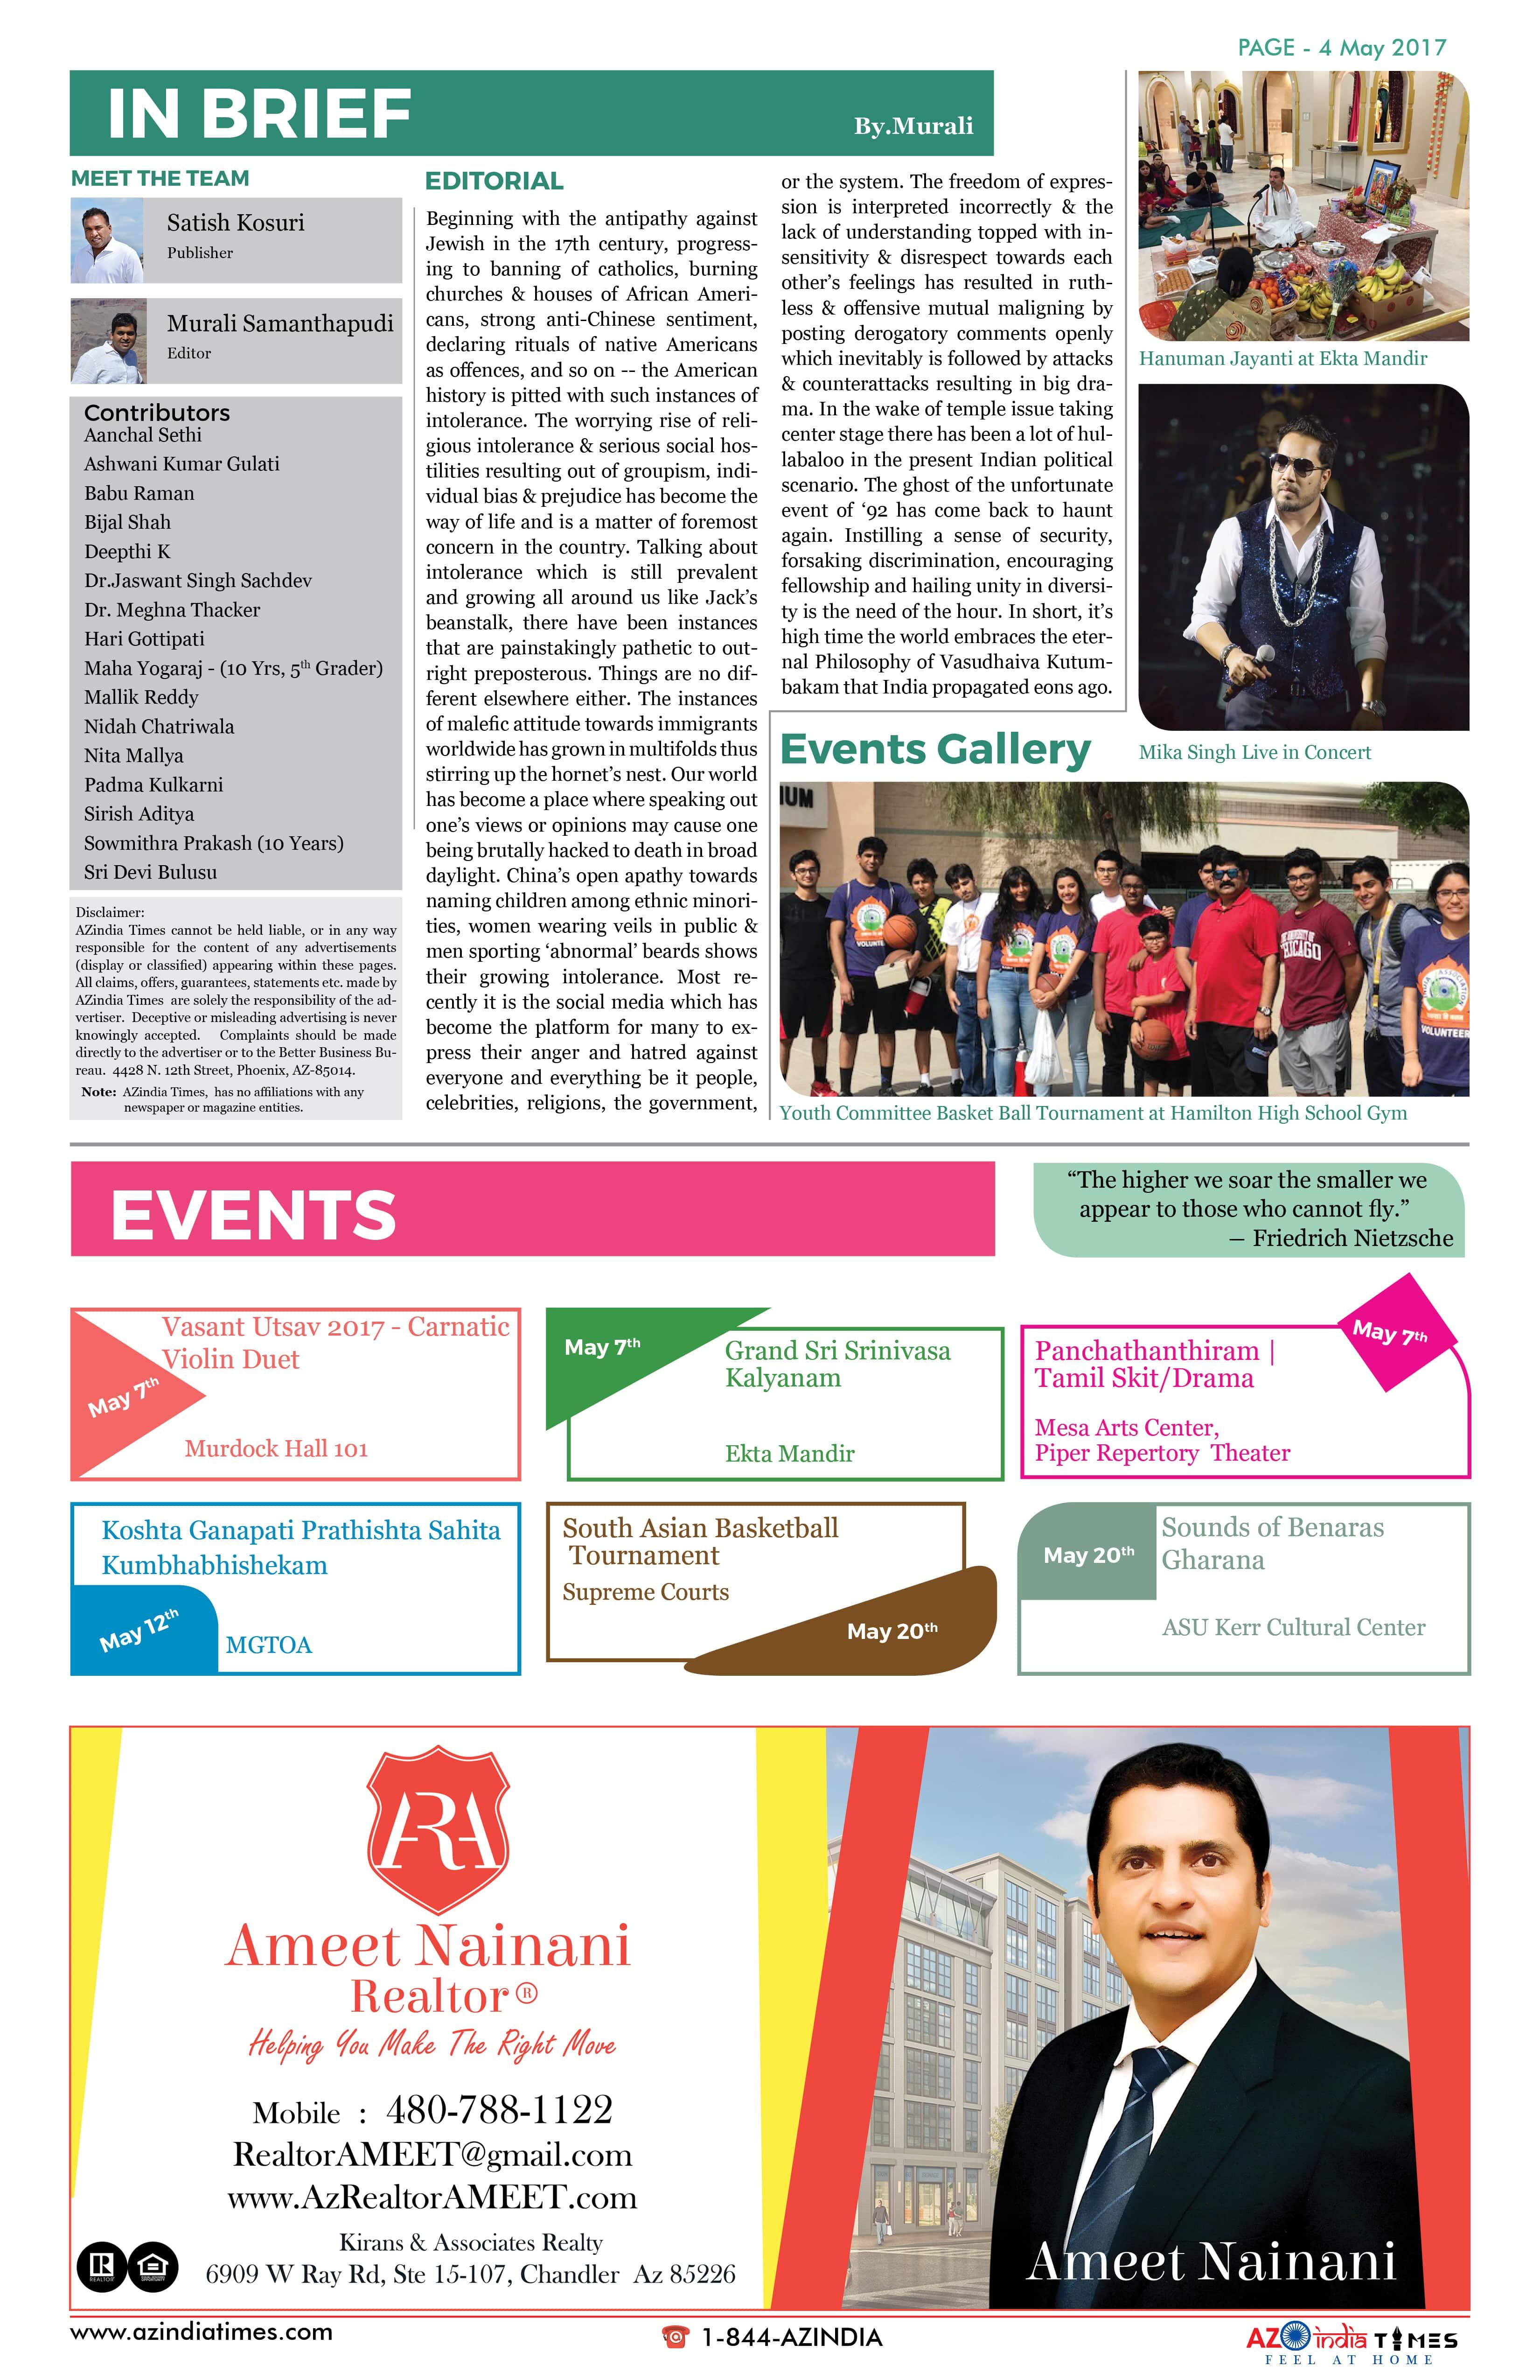 AZ INDIA MAY EDITION4